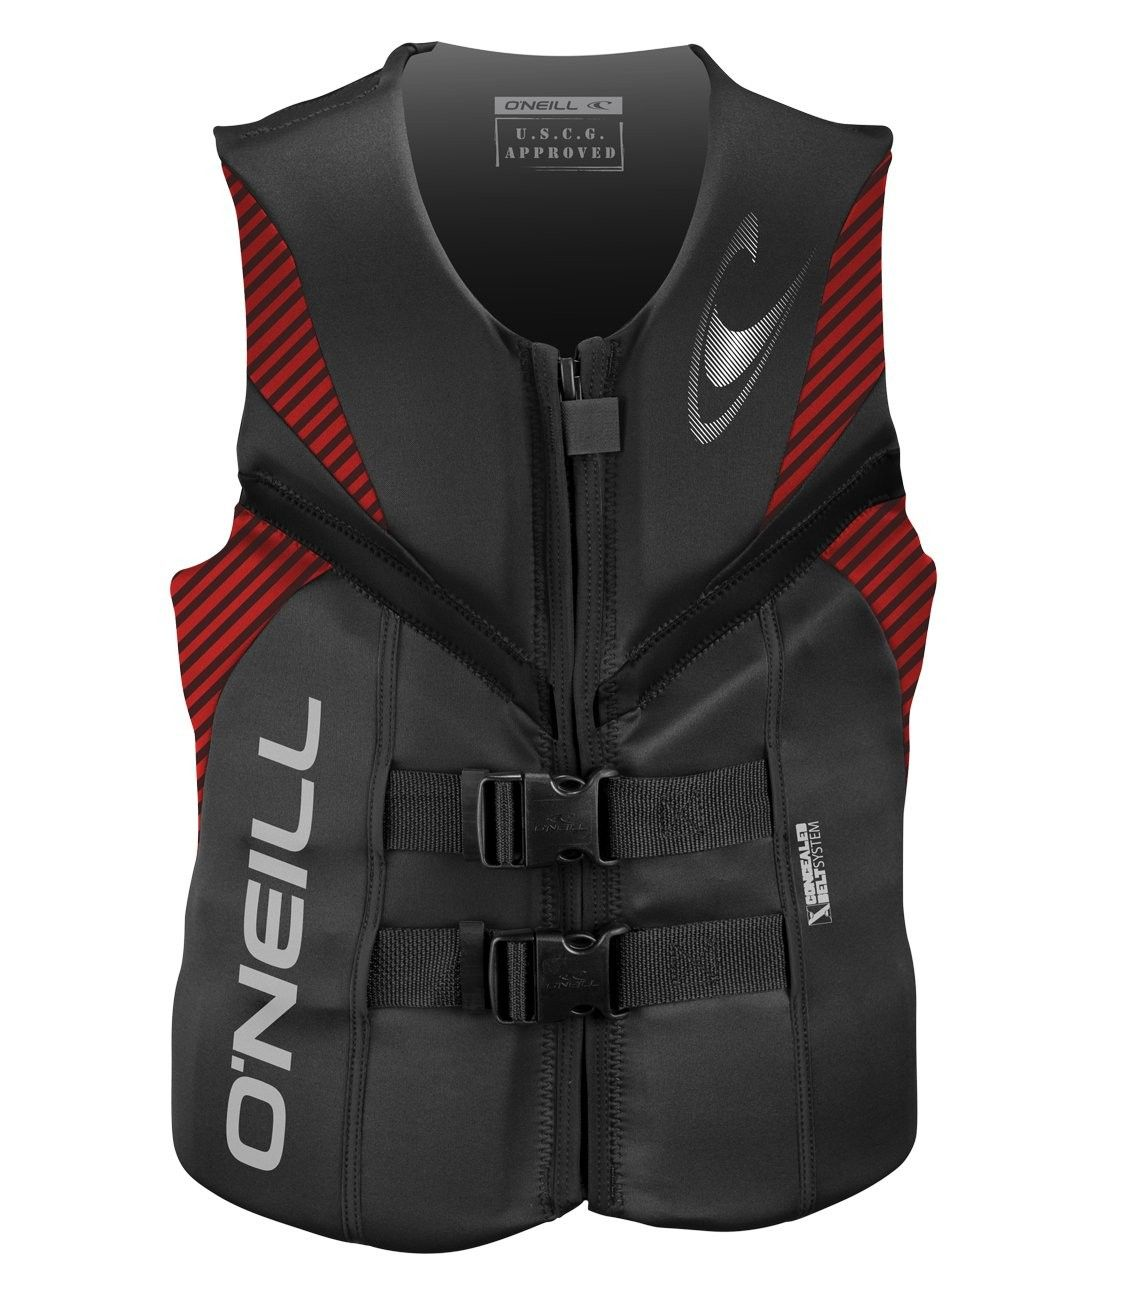 Men S Reactor Uscg Life Vest Graphite Red Black Cz125kpreh3 Size 3x Large Life Vest Life Vests Wakeboarding